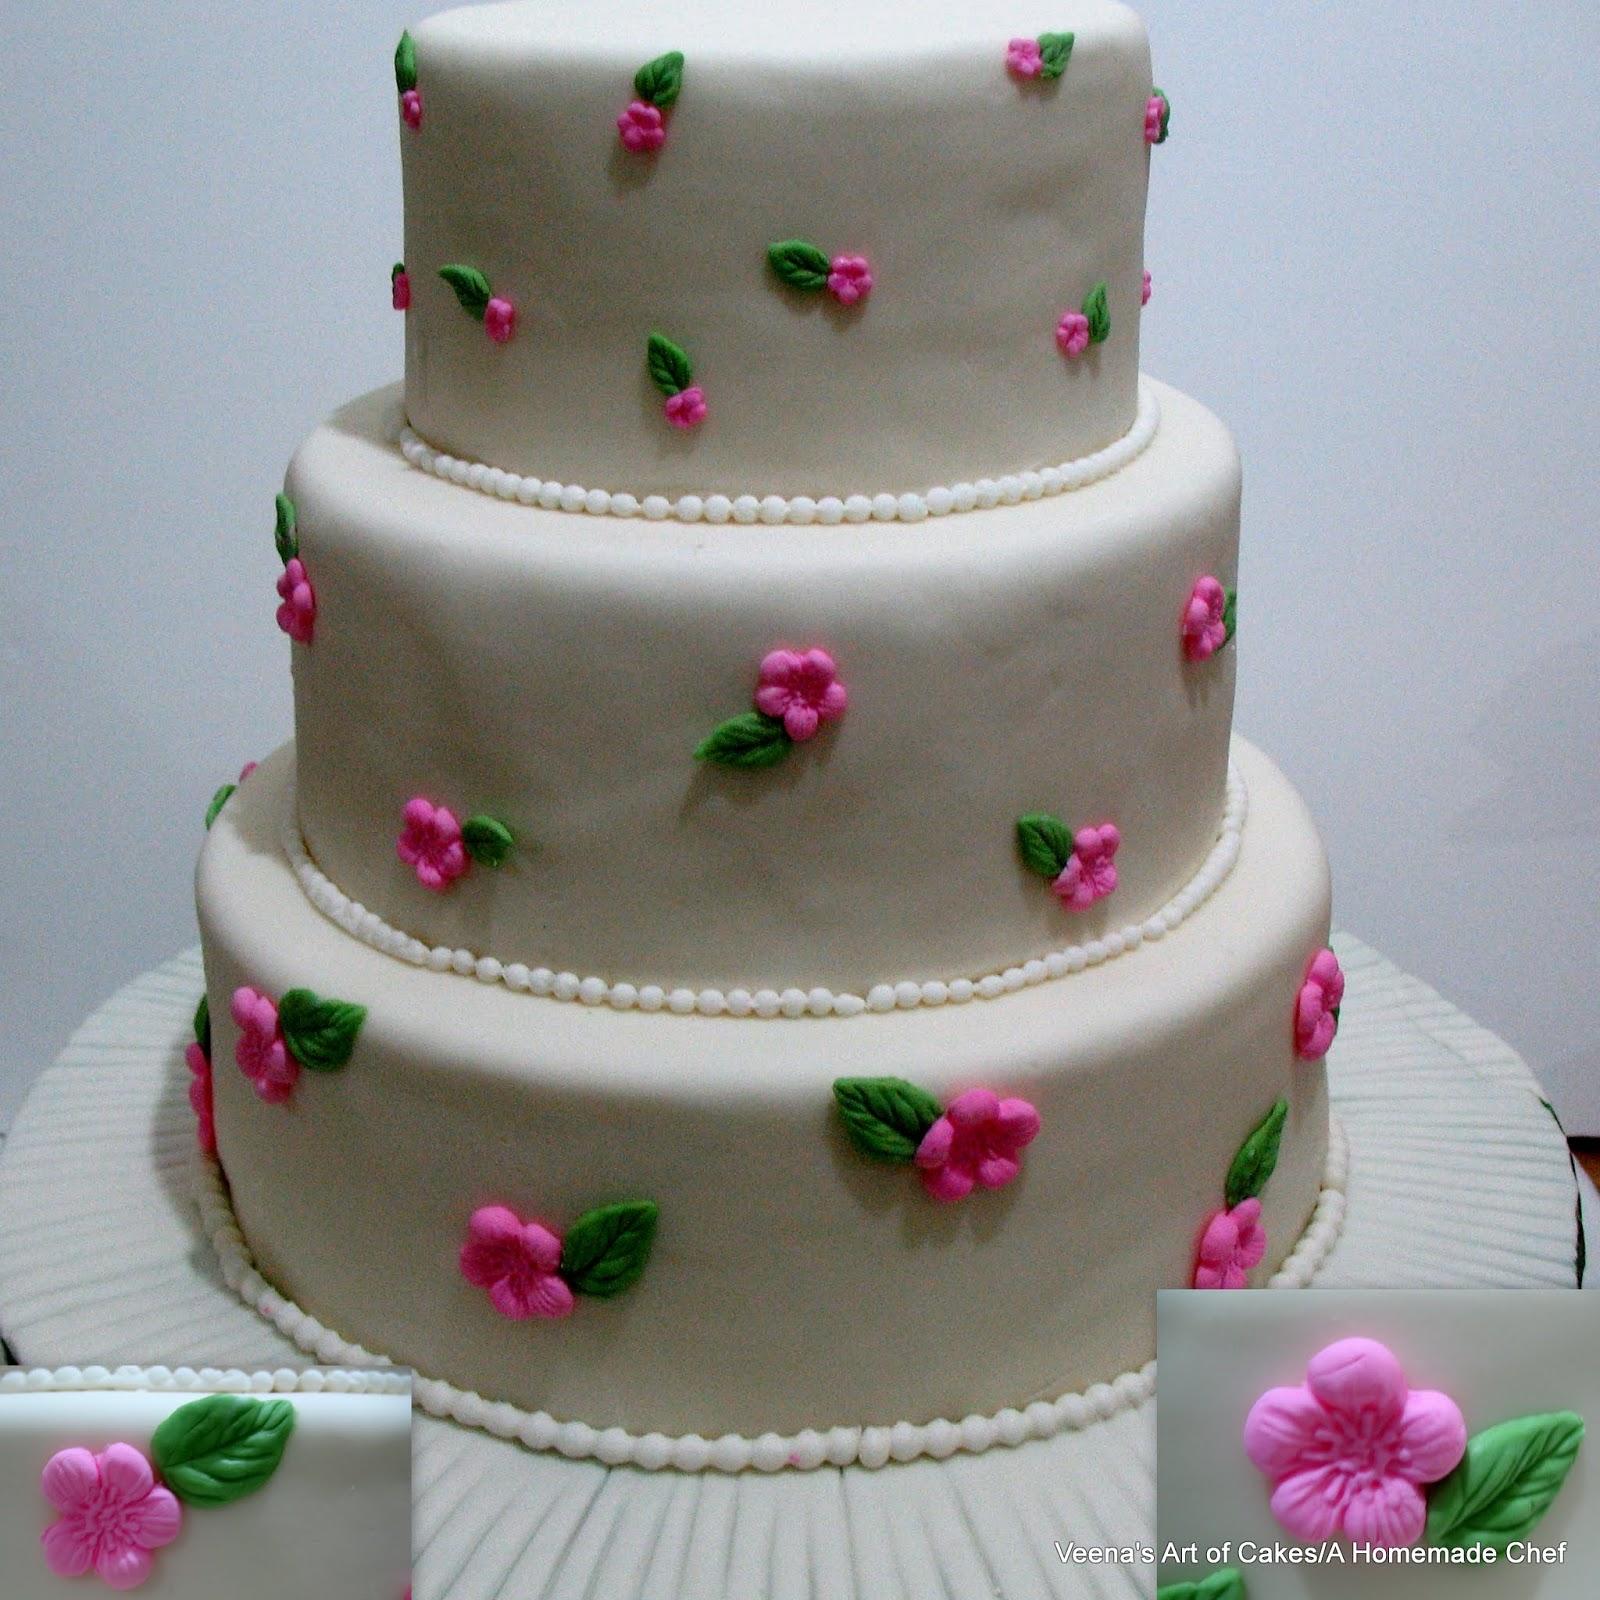 Two wedding cakes Veena Azmanov